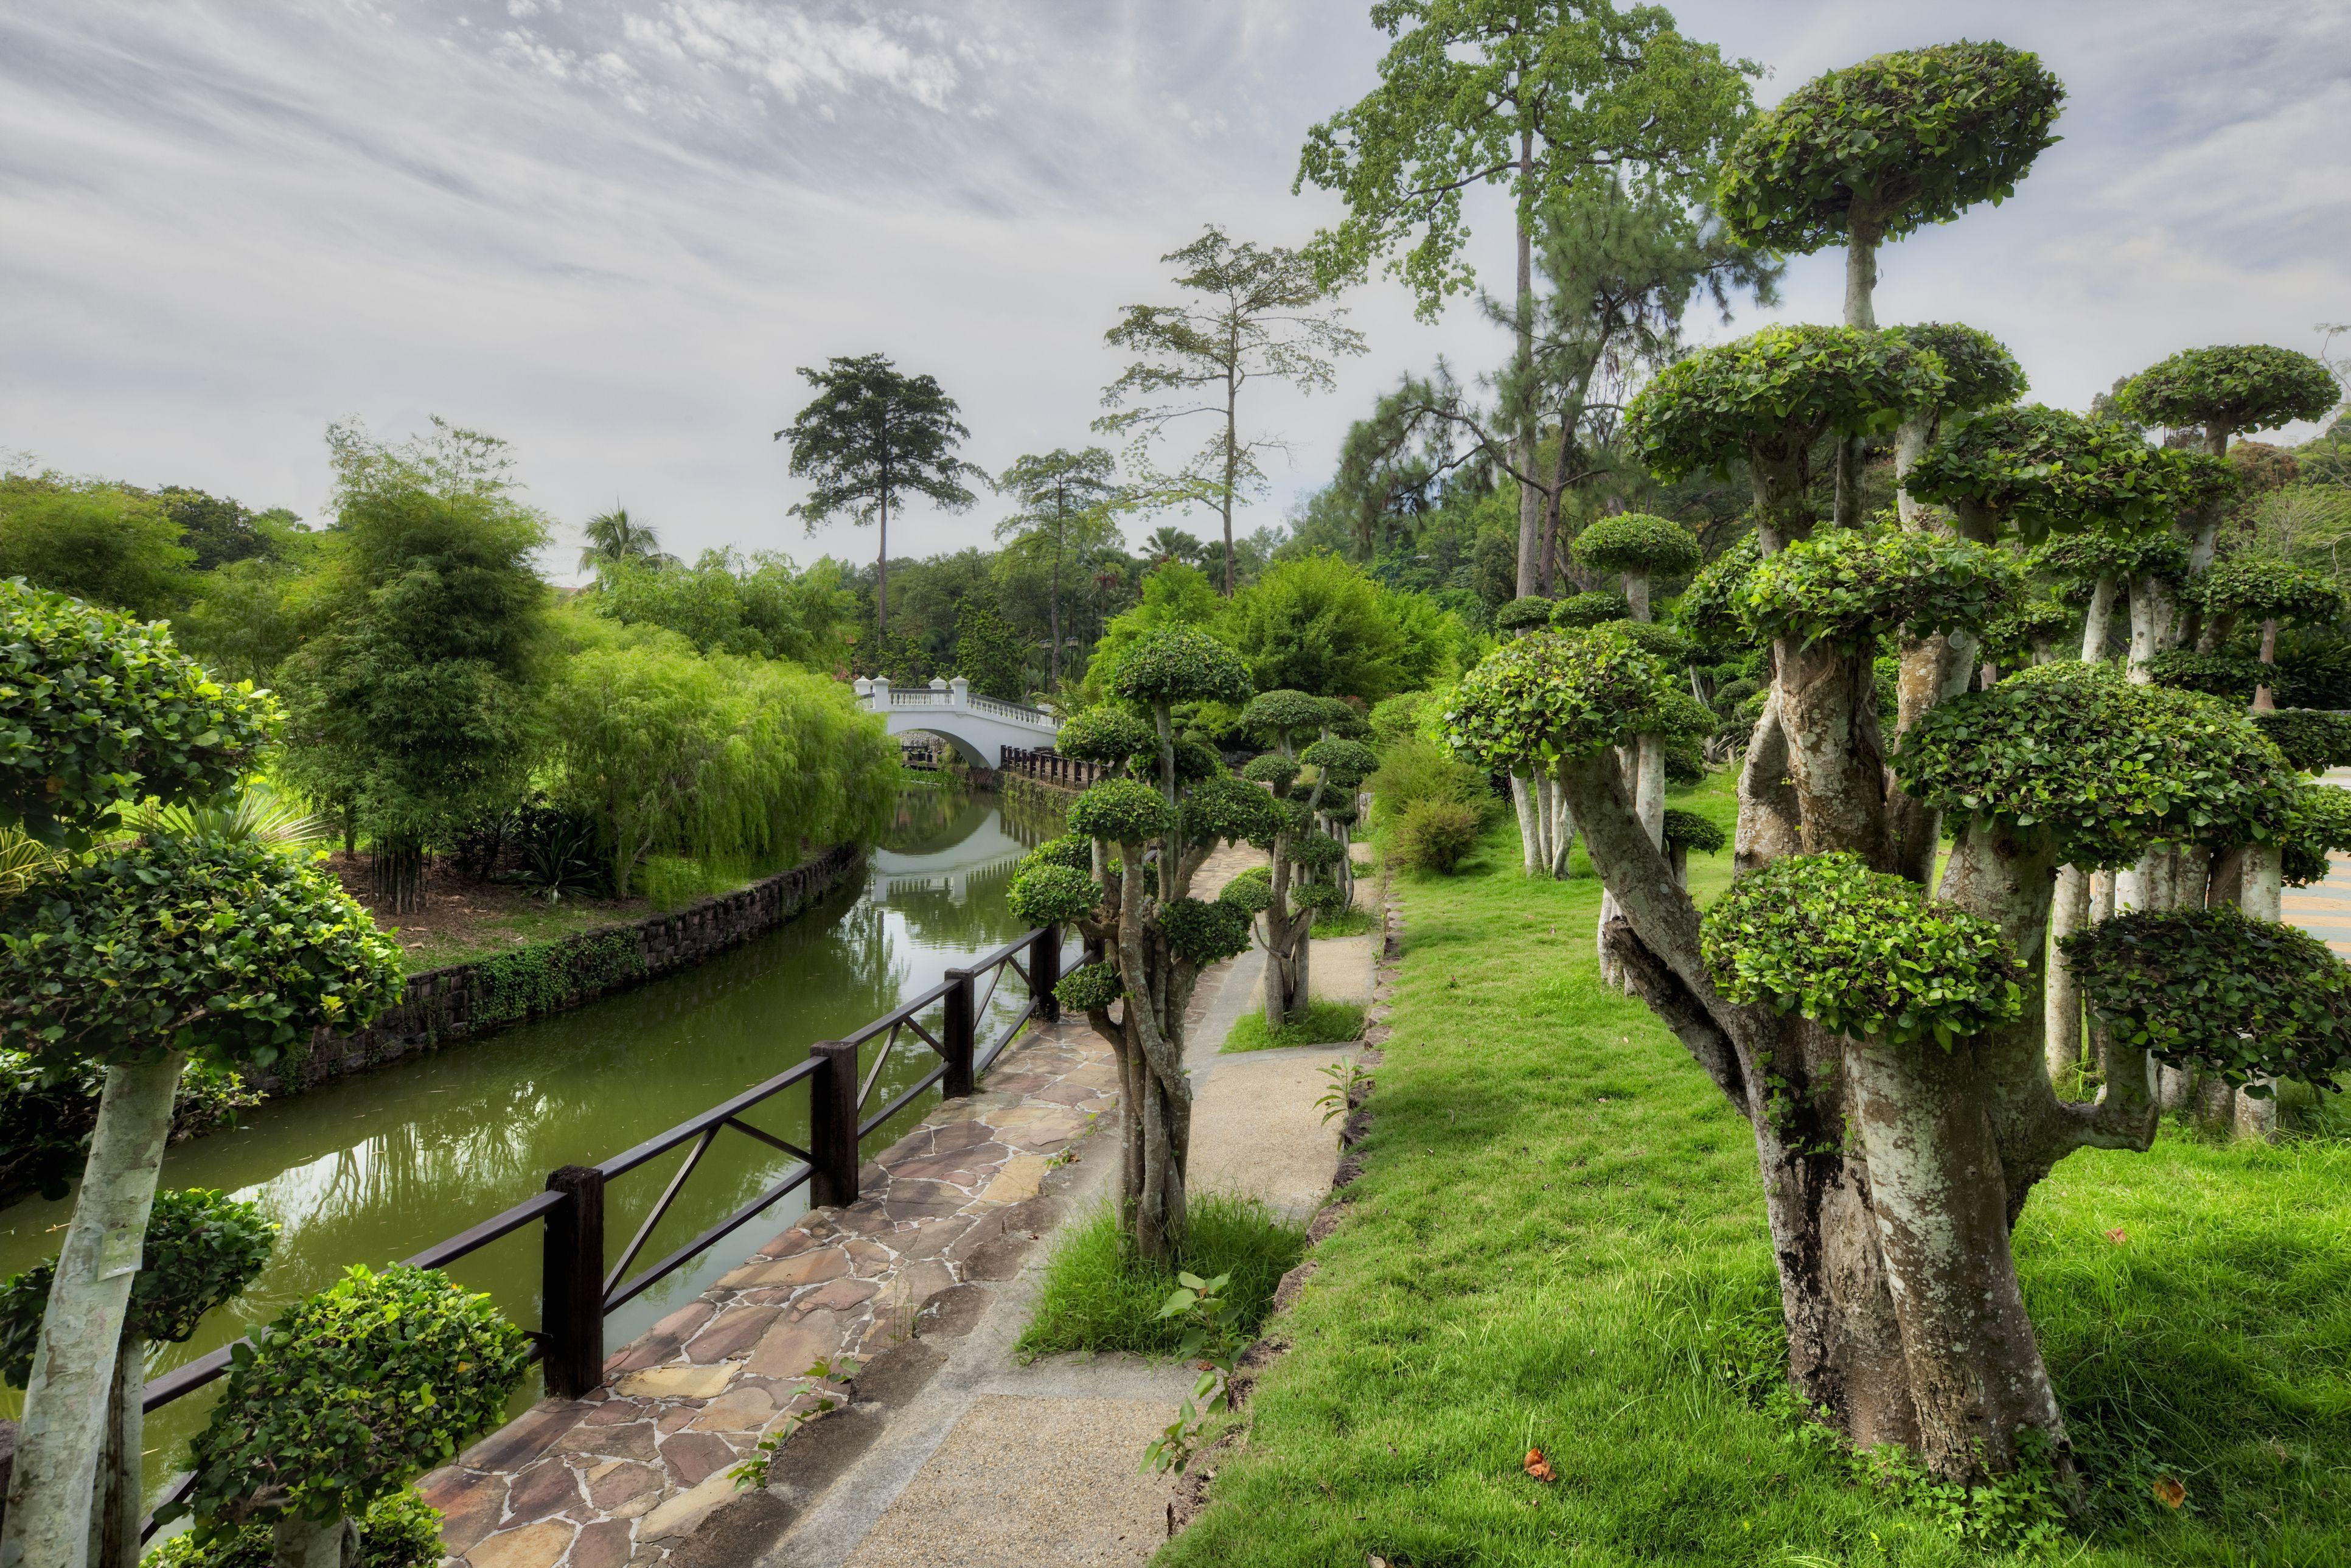 Kunjungi Perdana Botanical Garden Di Kuala Lumpur